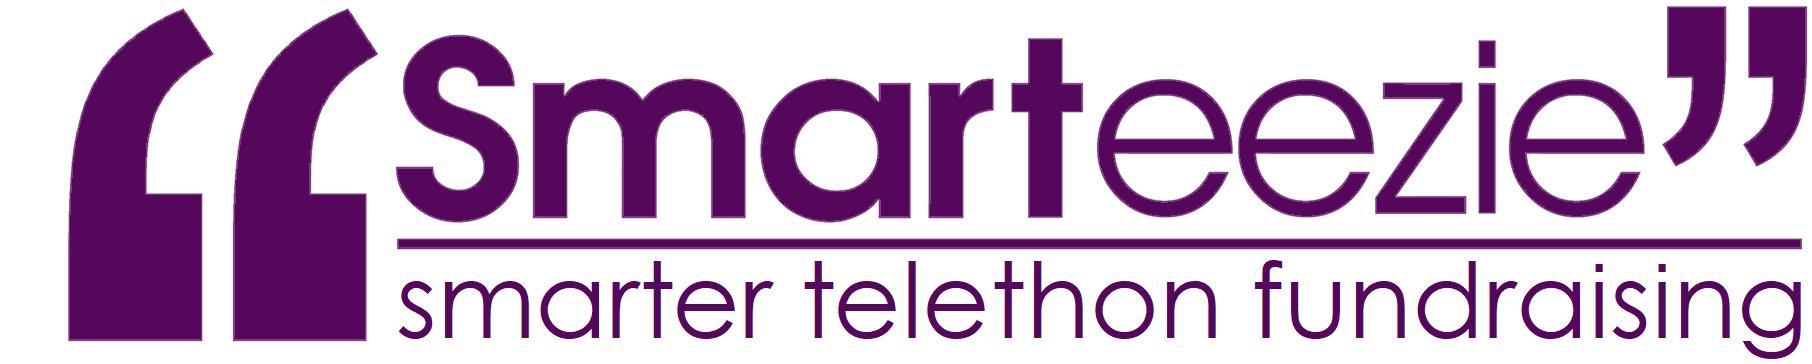 SmartEezie - telephone fundraising management software